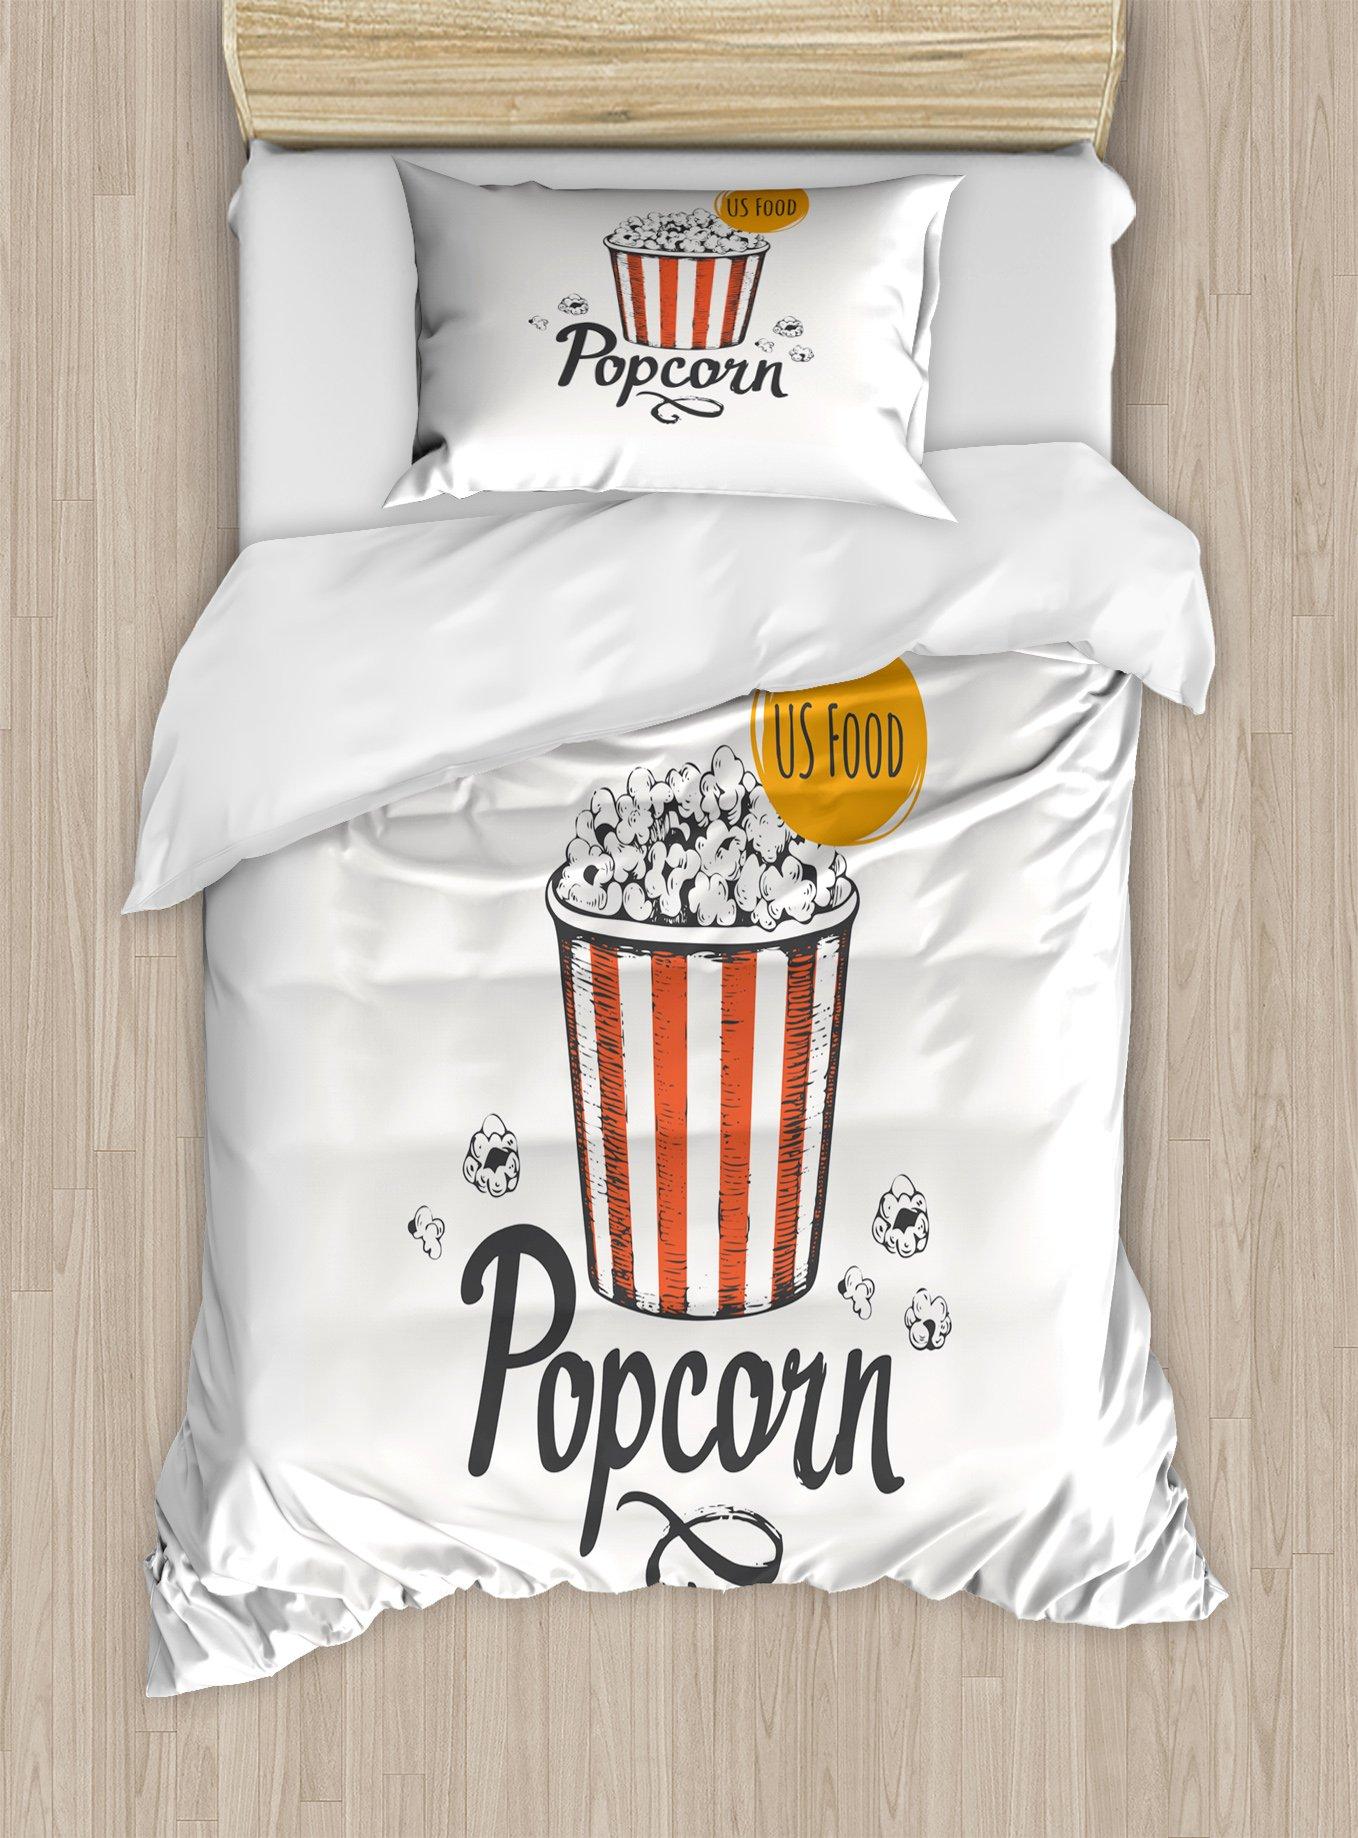 Ambesonne Movie Theater Twin Size Duvet Cover Set, Sketch Design Cinema Snack US Fast Food Pop Corn Art, Decorative 2 Piece Bedding Set with 1 Pillow Sham, Charcoal Grey Vermilion Marigold